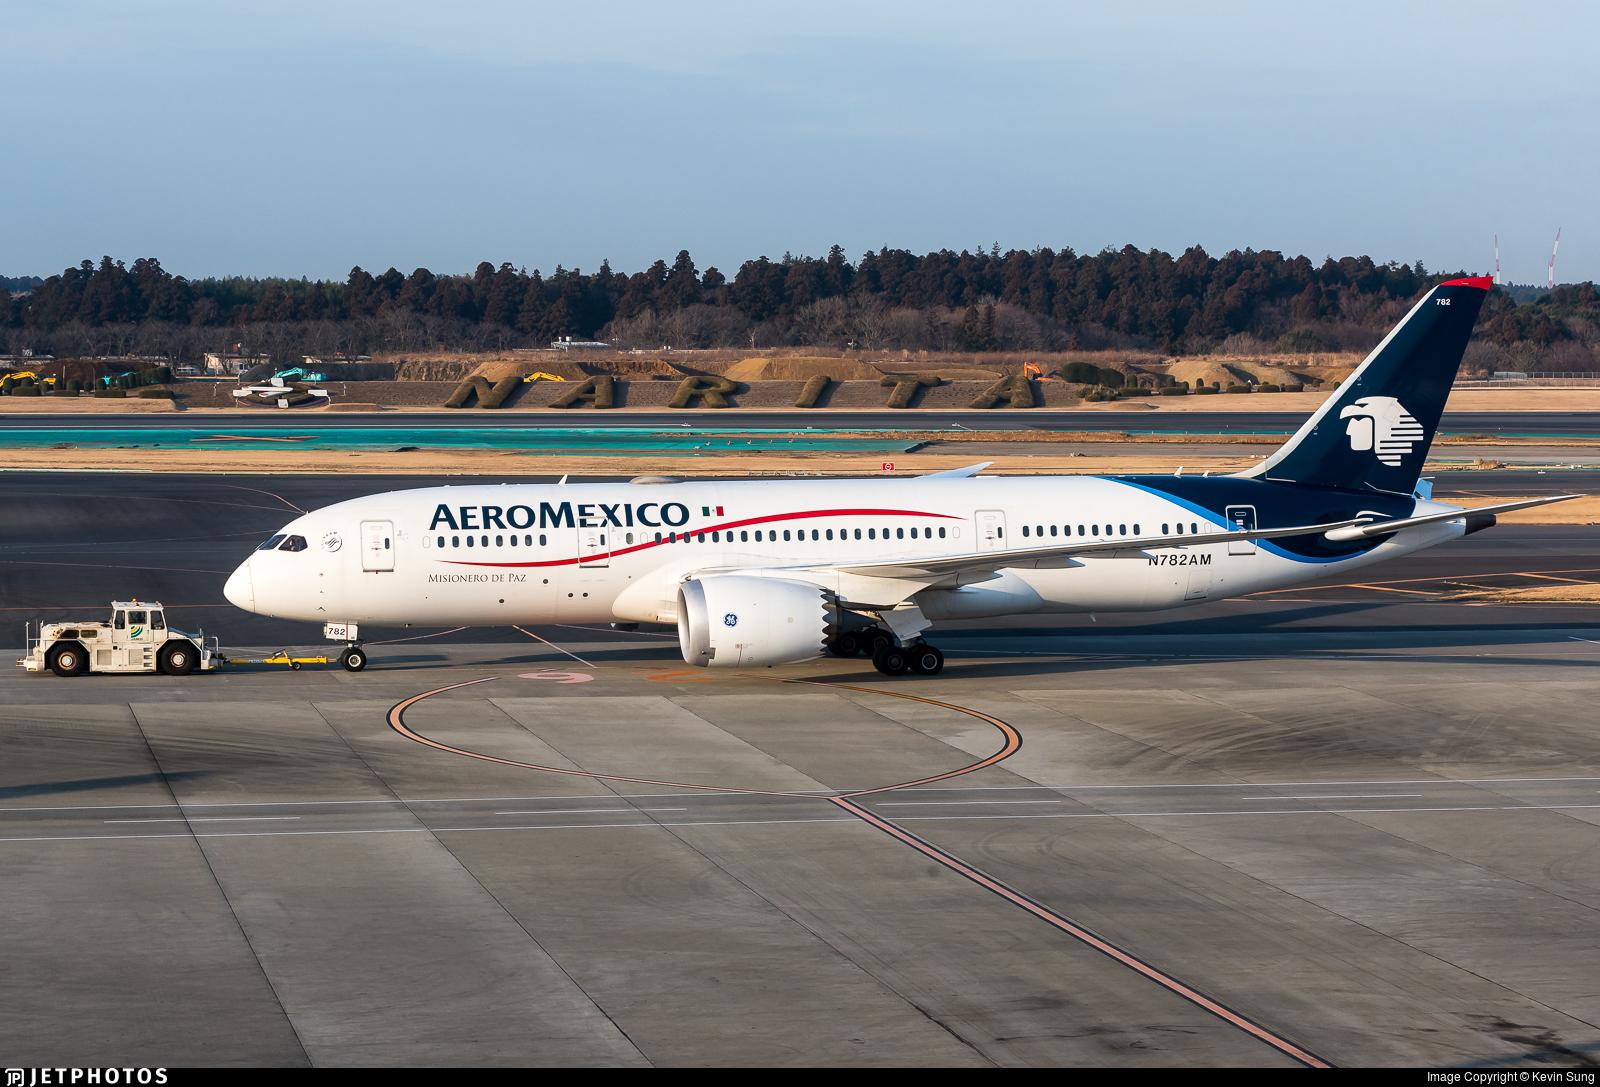 N782AM - Boeing 787-8 Dreamliner - Aeroméxico